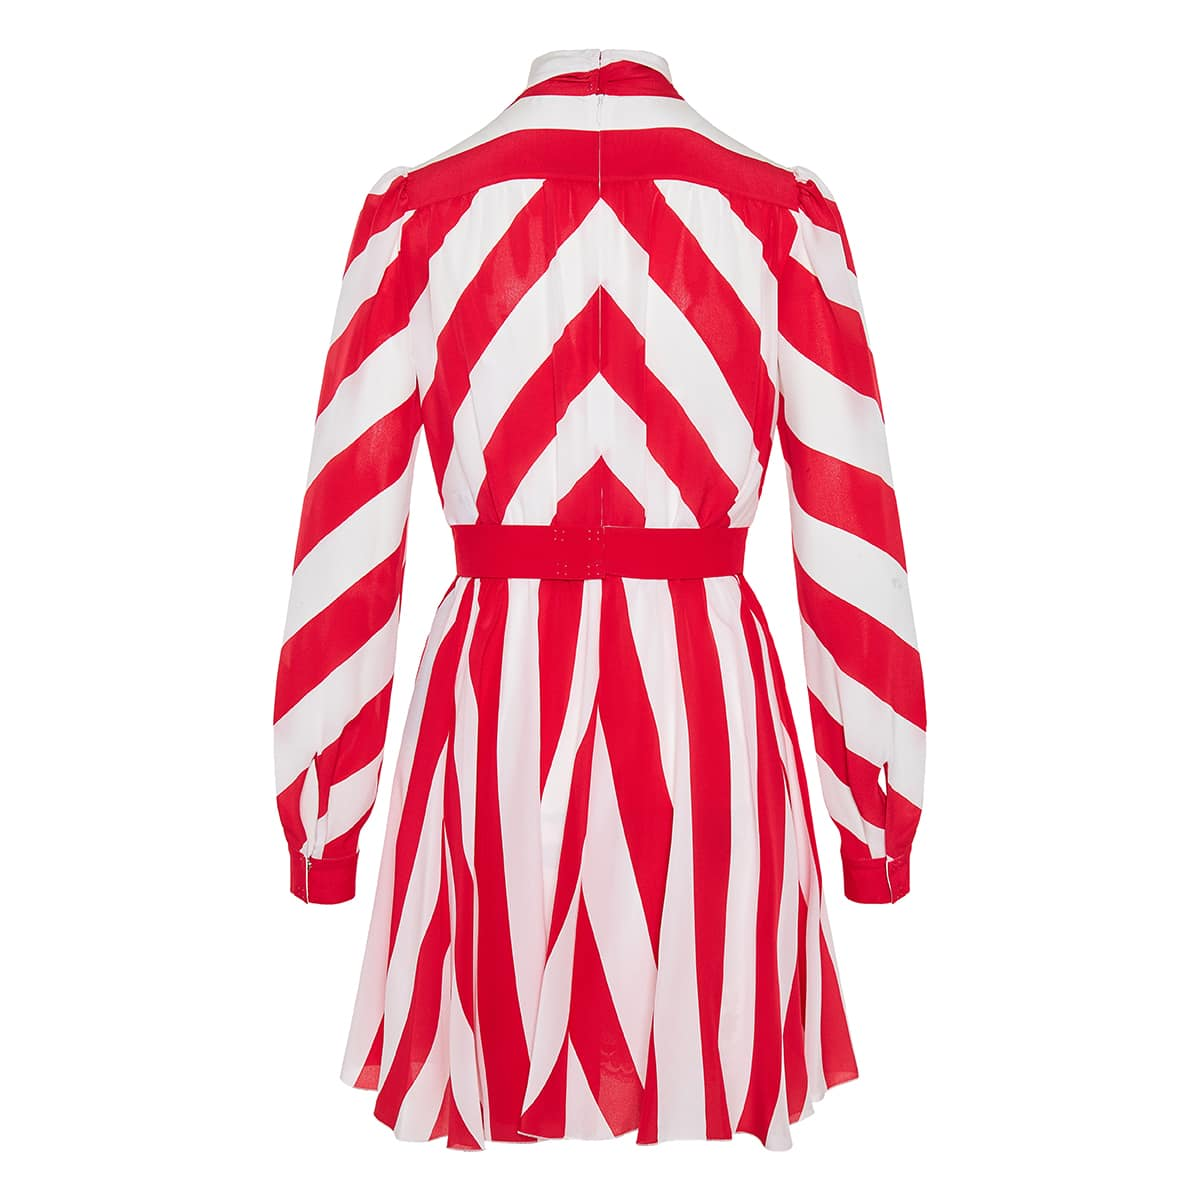 Bow-tie striped mini dress